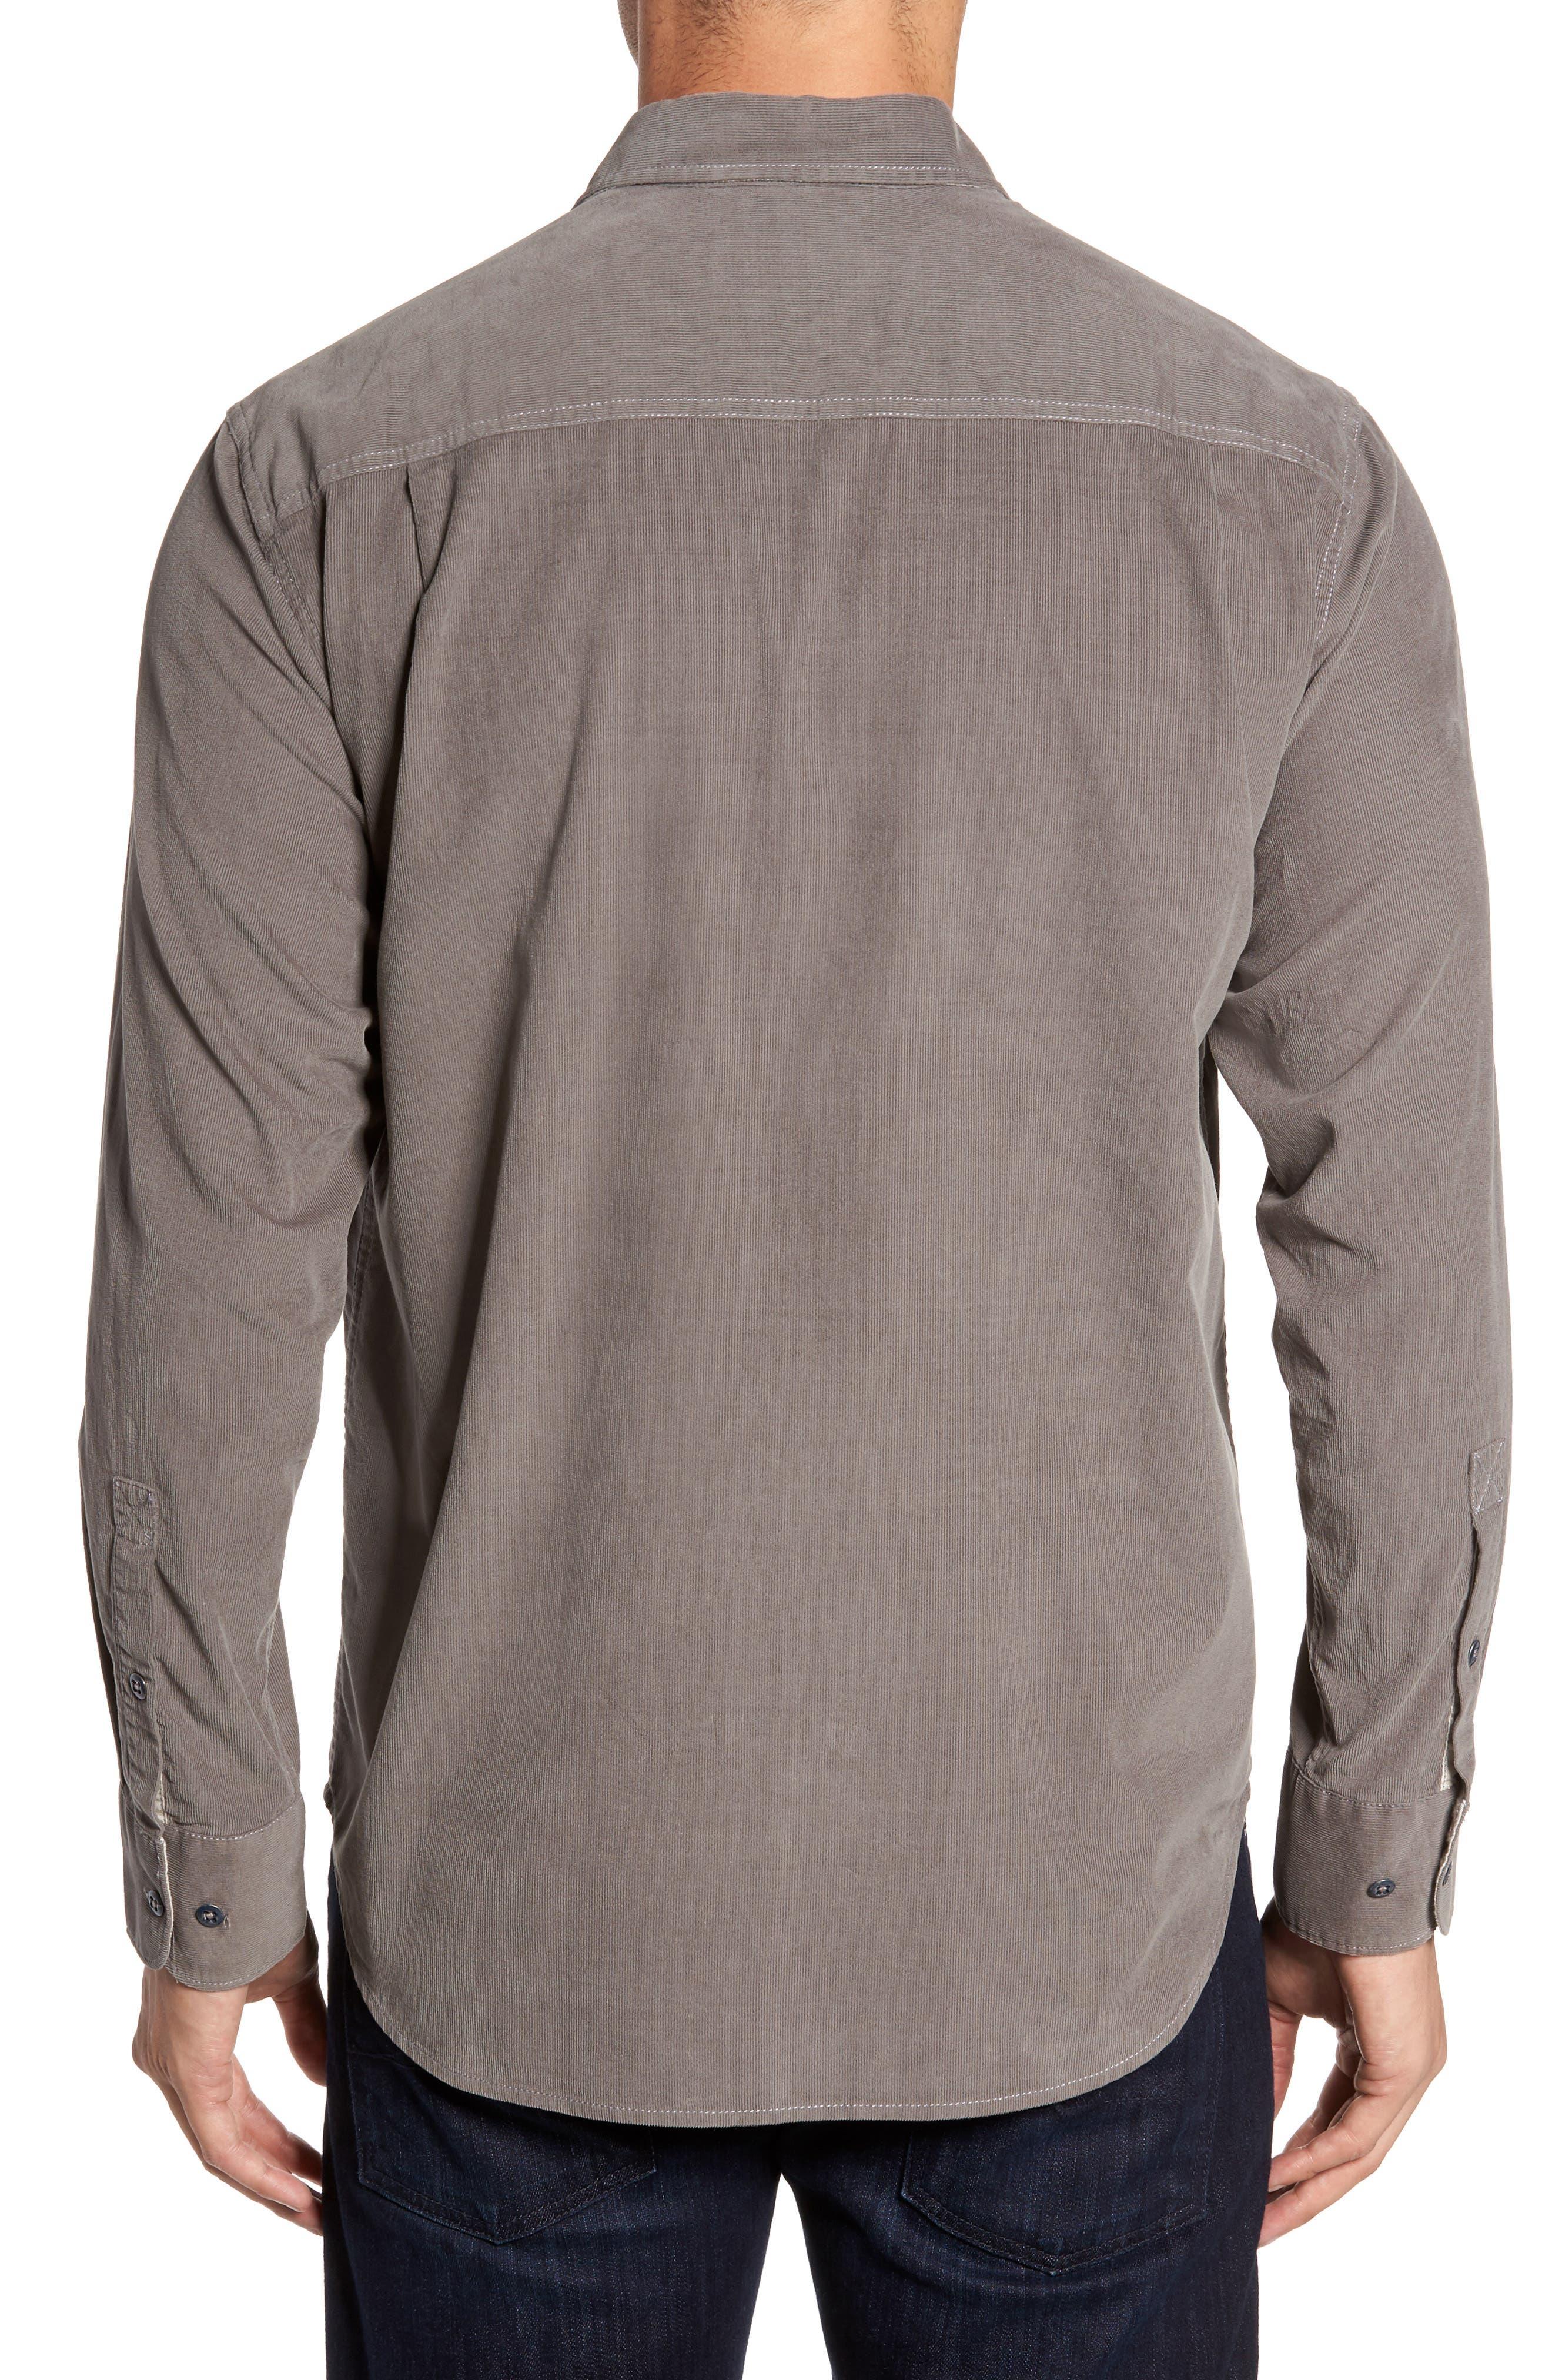 Harrison Cord Standard Fit Shirt,                             Alternate thumbnail 2, color,                             Pebble Grey